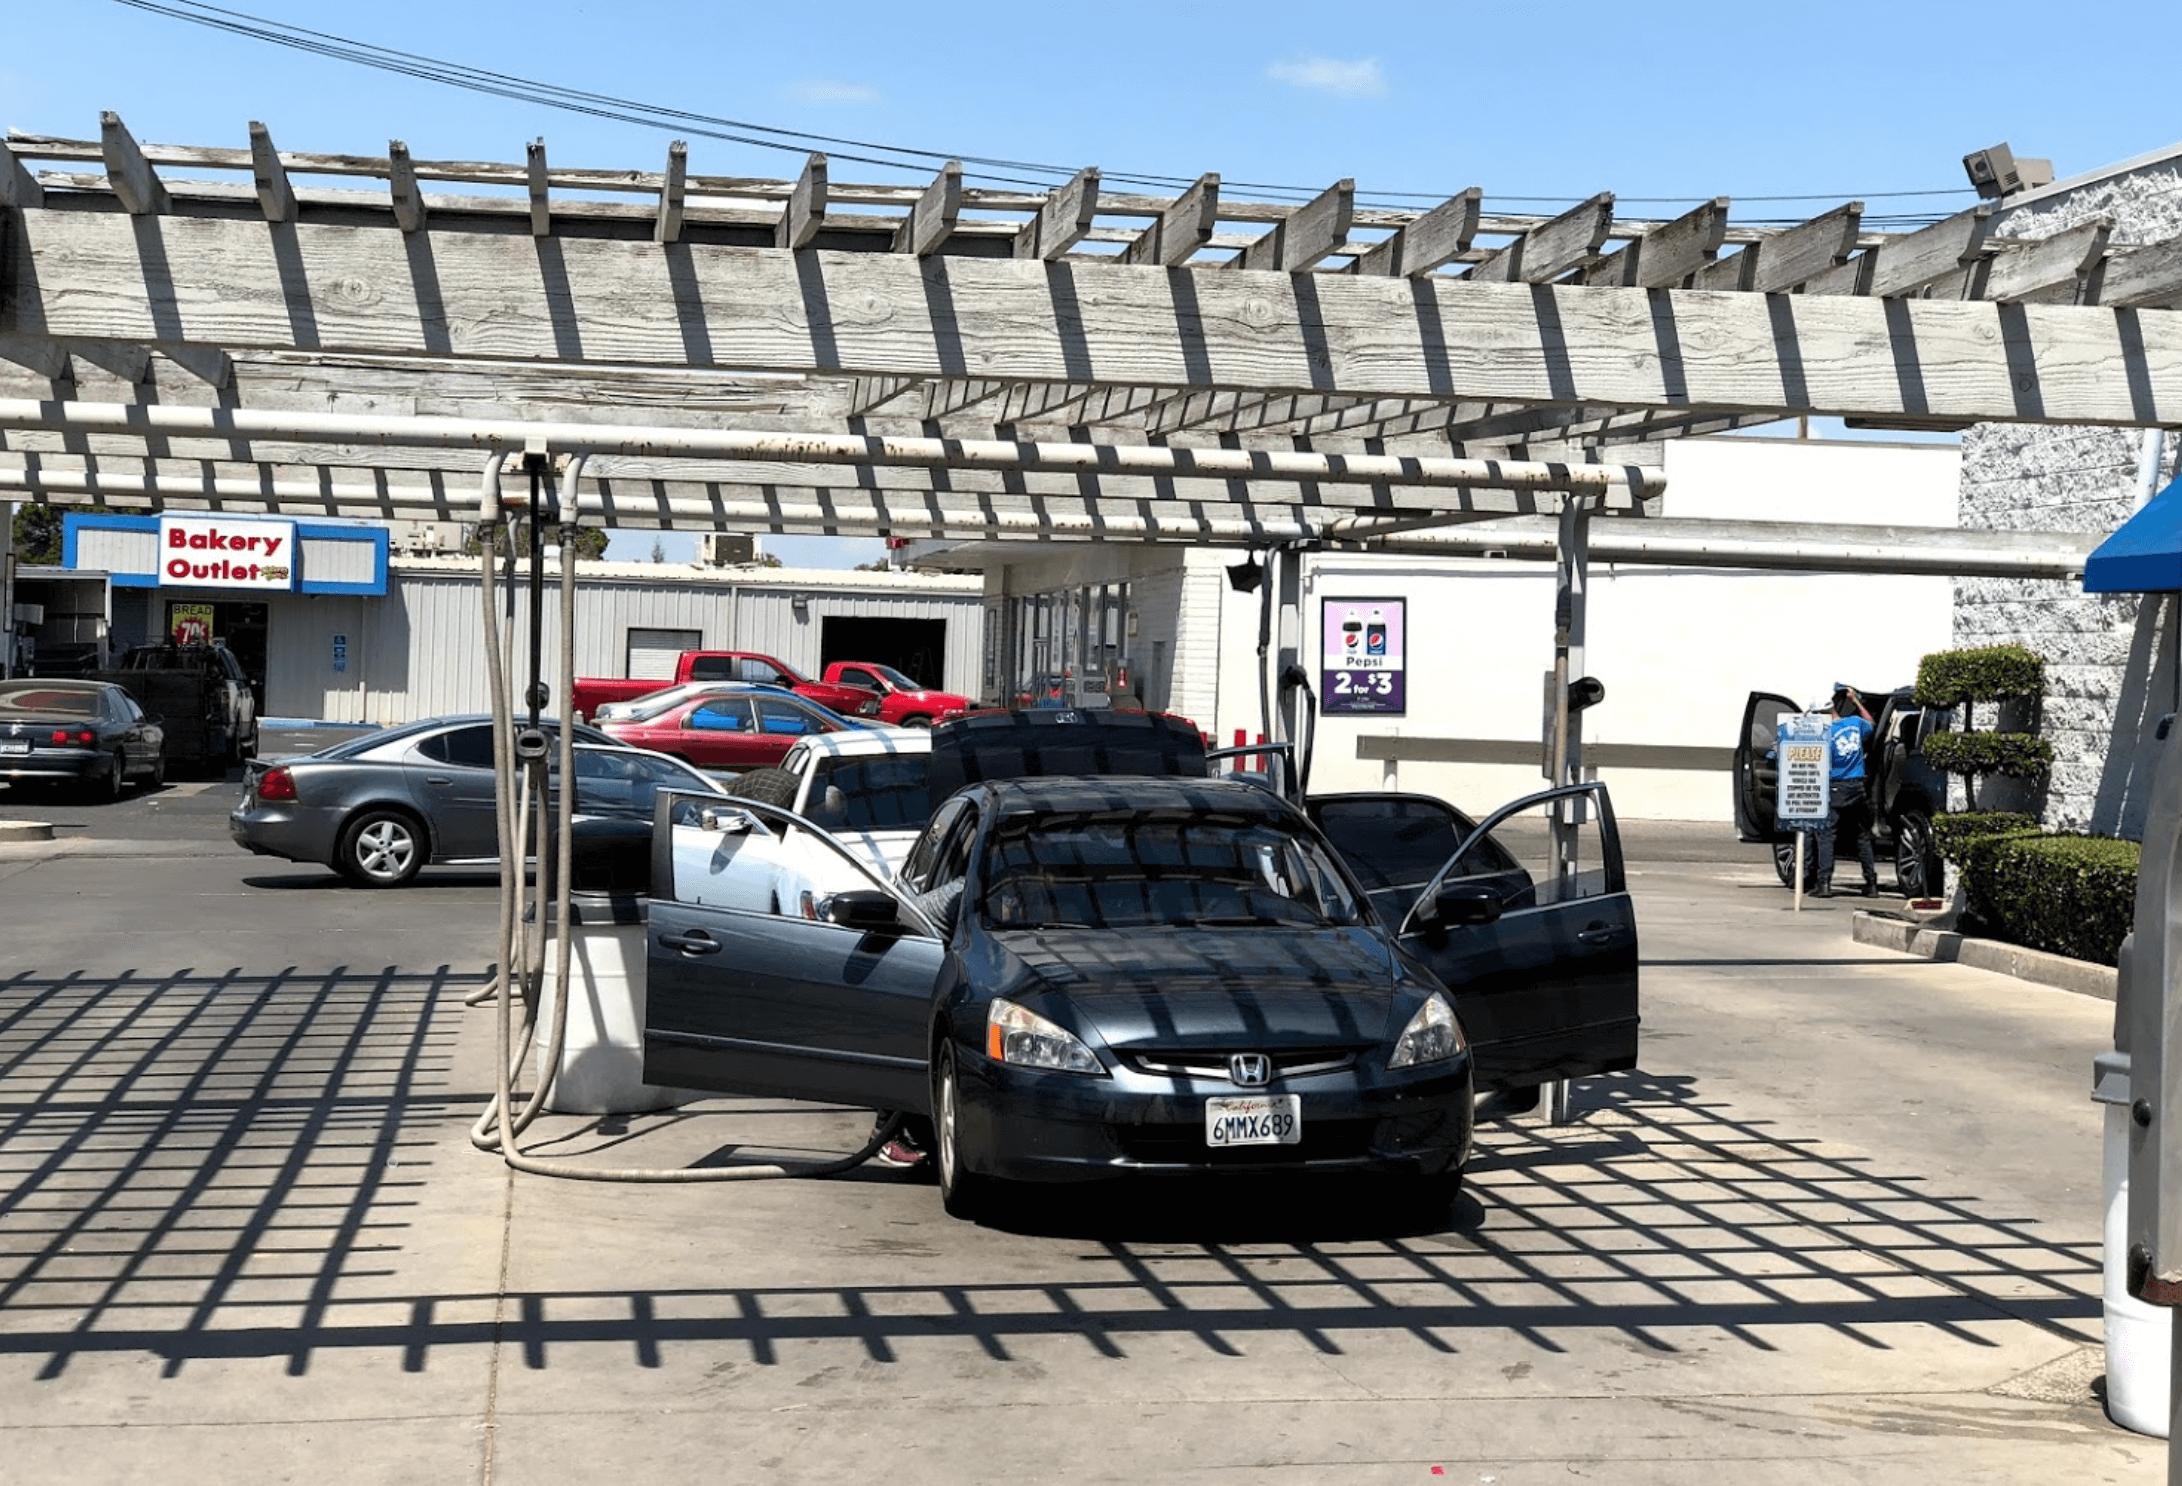 Cars being vacuumed